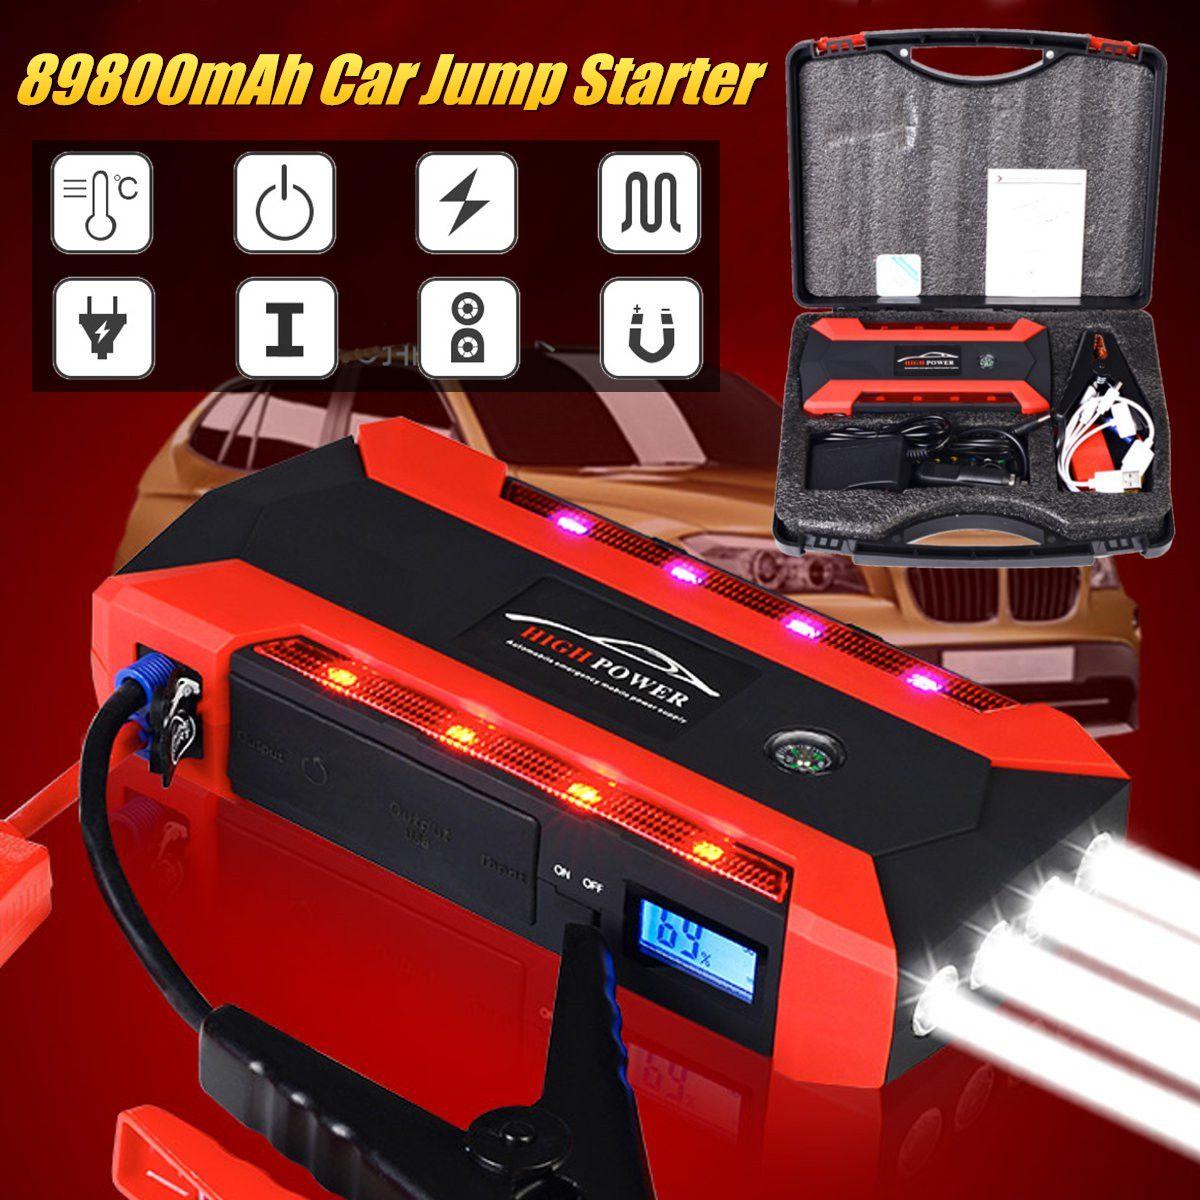 600A 68800mAh 12V 4USB arrancador de batería de coche banco de energía recargable batería de emergencia multifunción linterna SOS